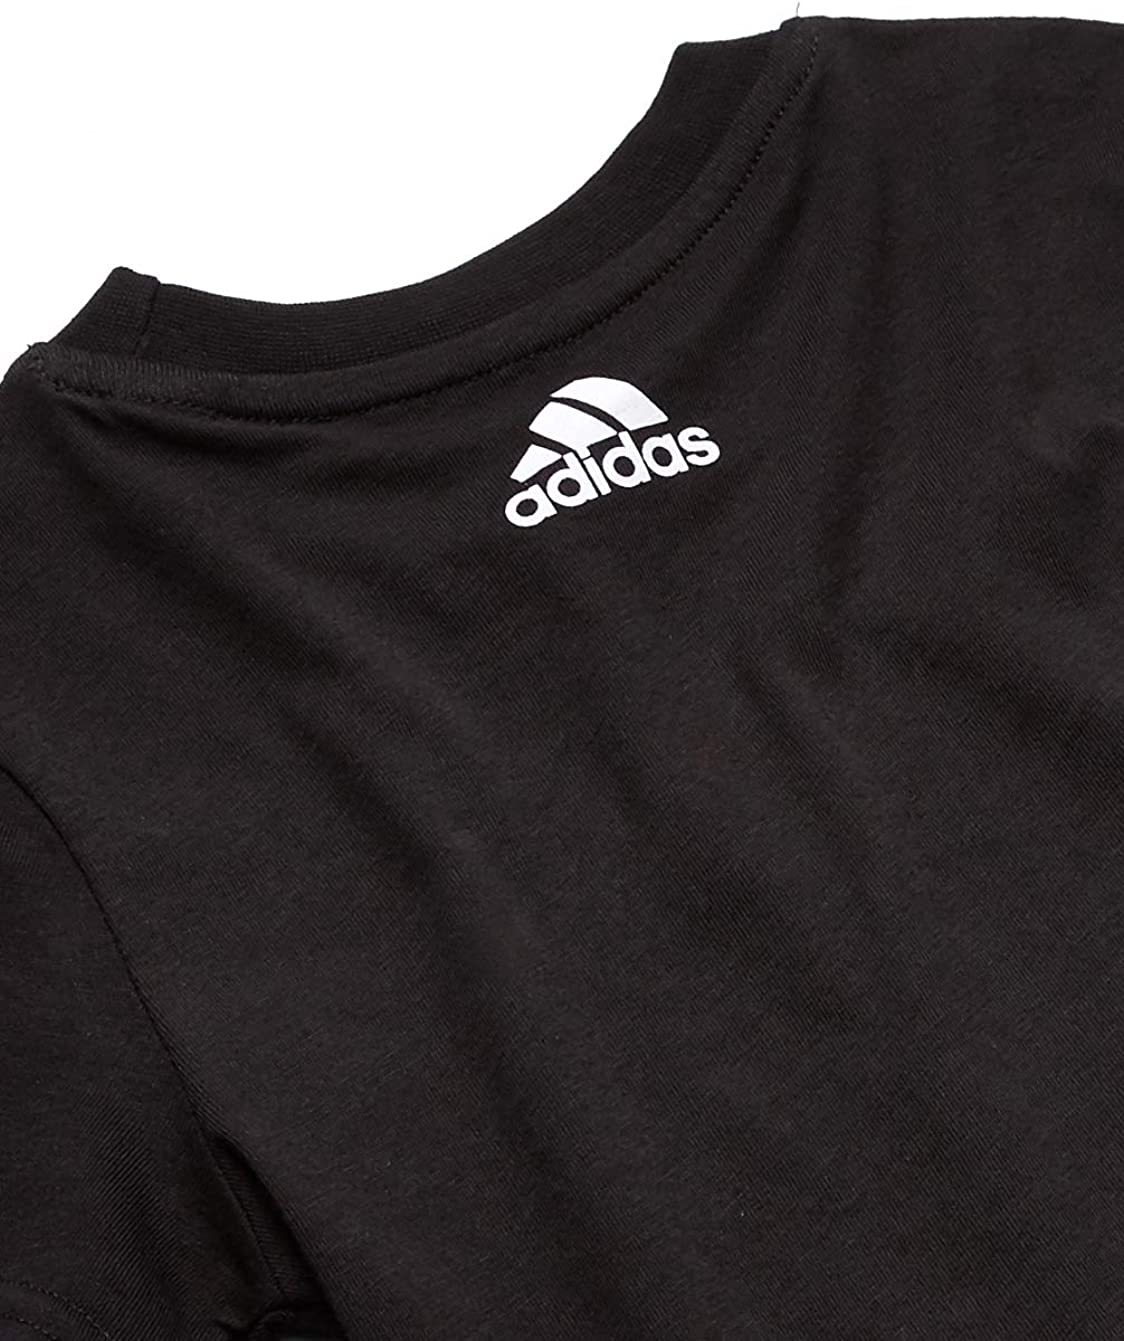 adidas Boys' Badge of Sport Soccer Tee: Clothing